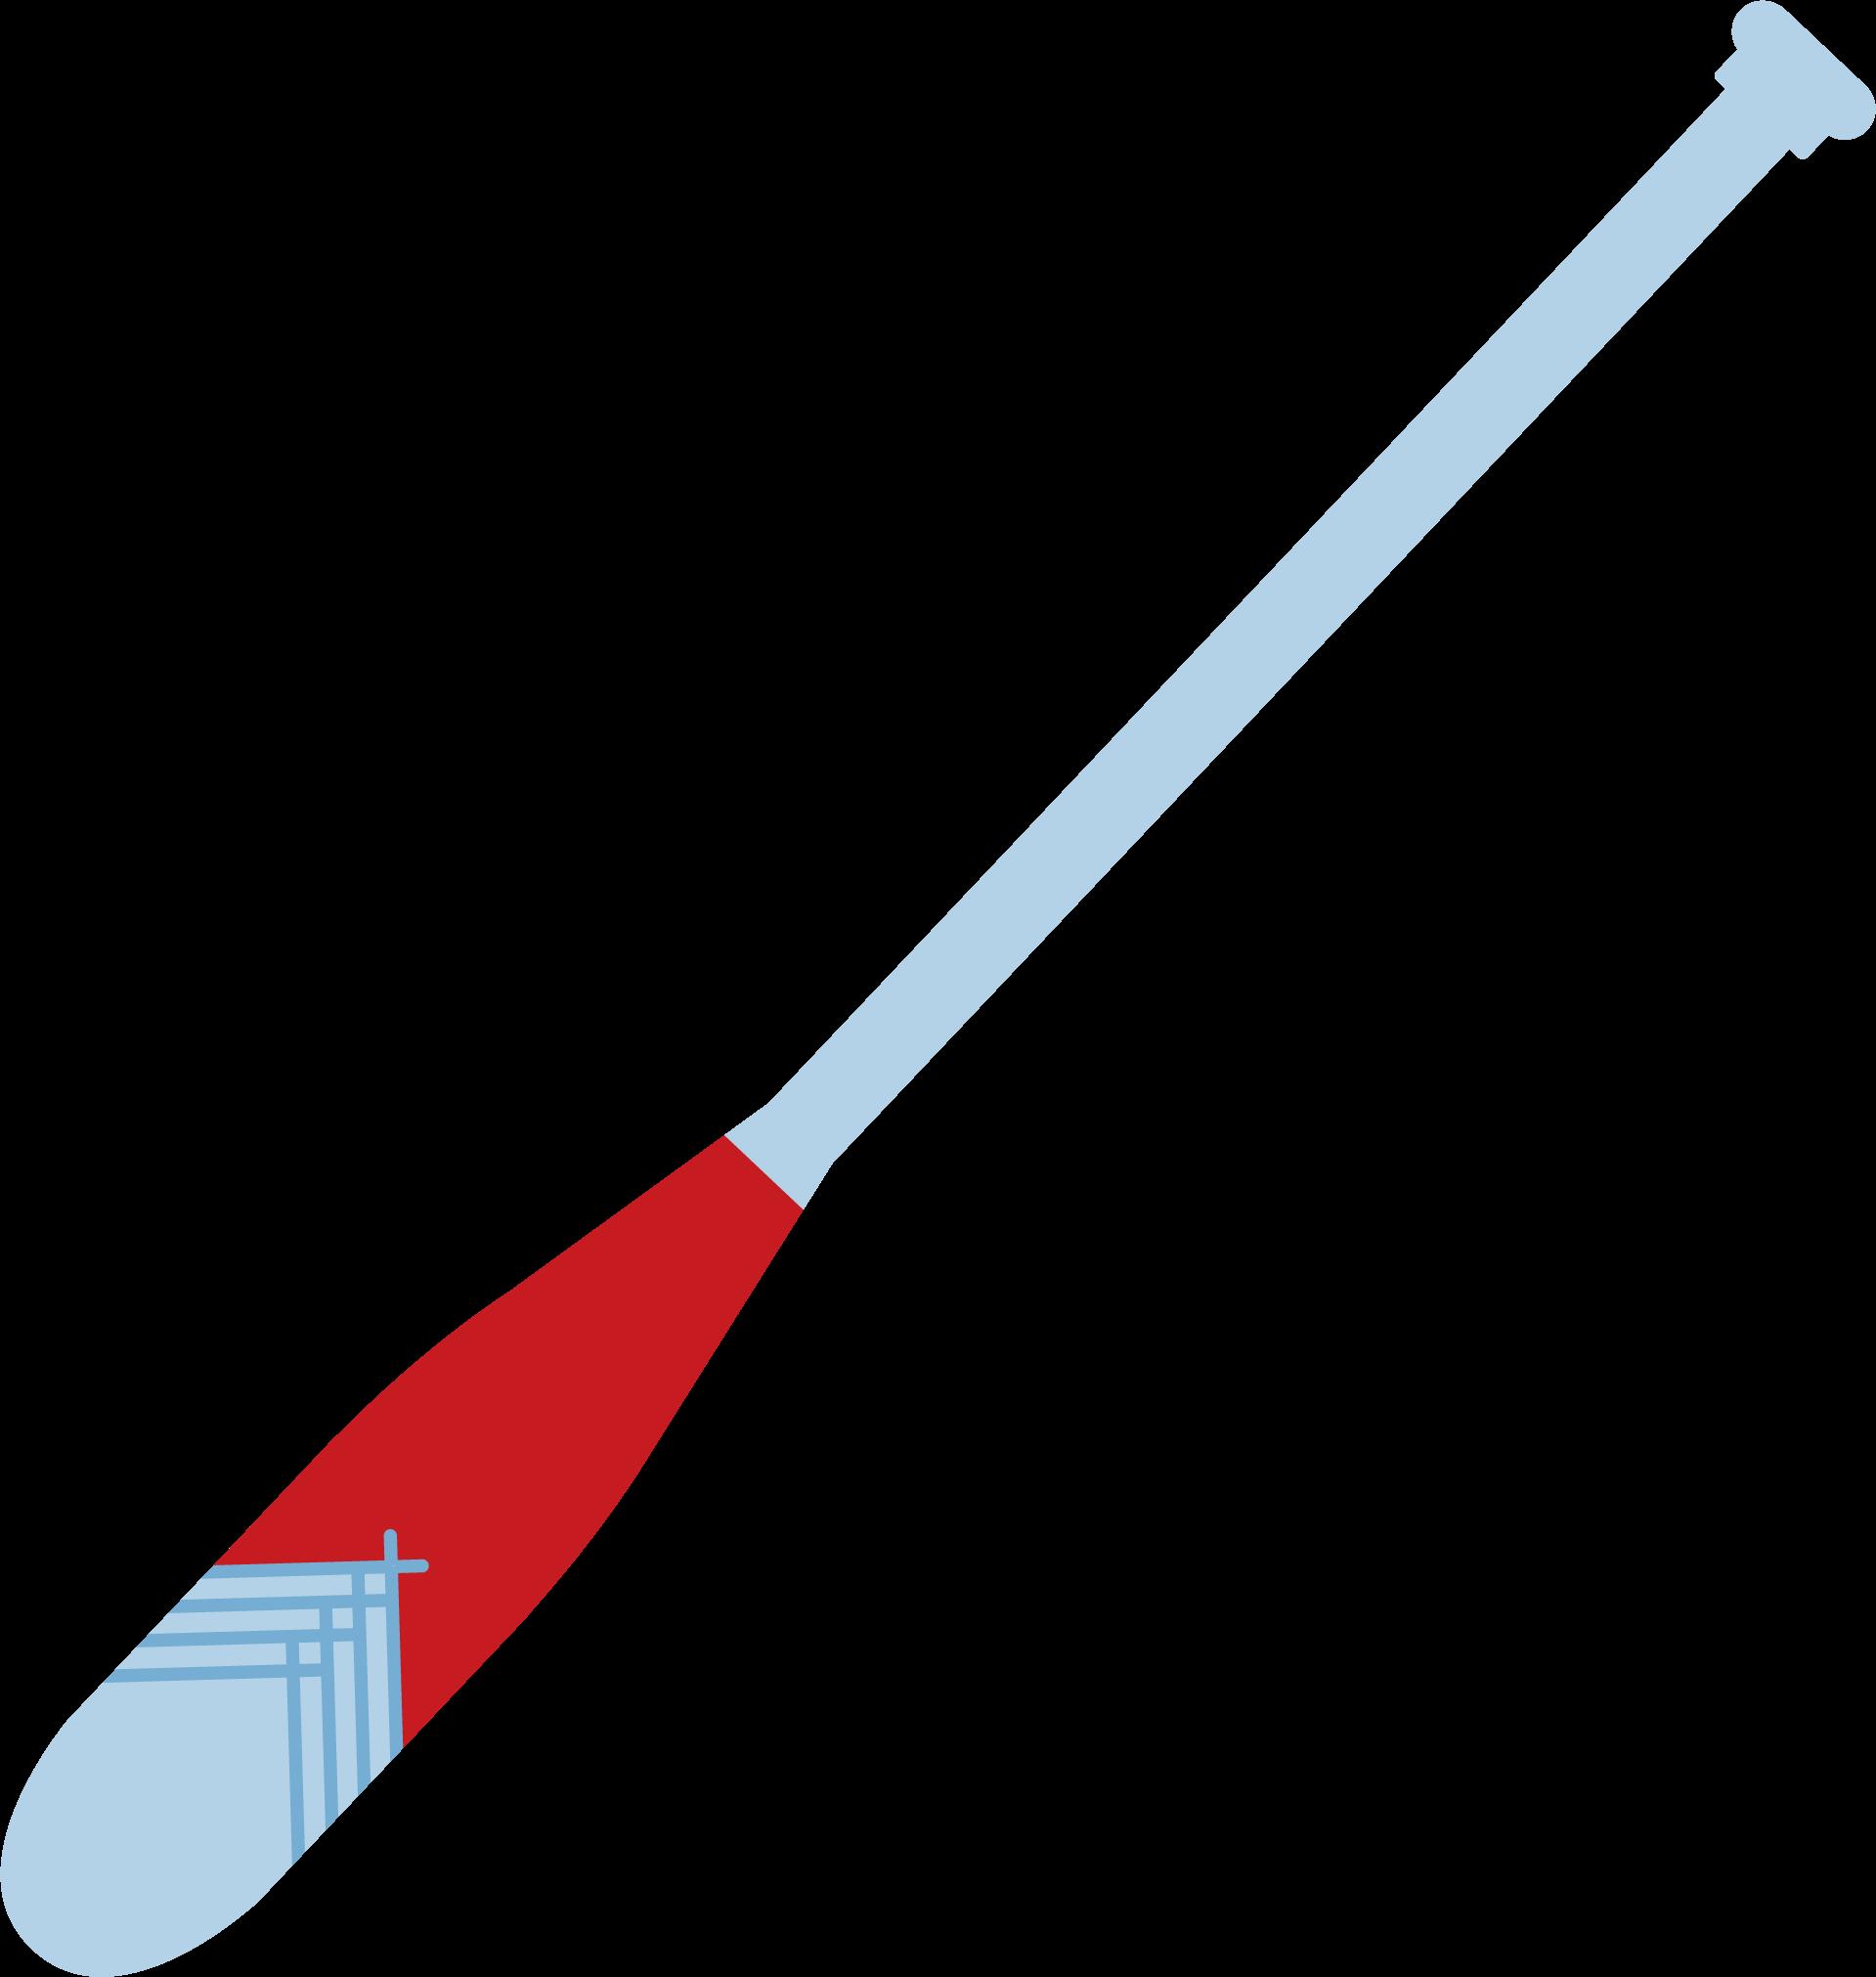 Paddle SVG Cut File